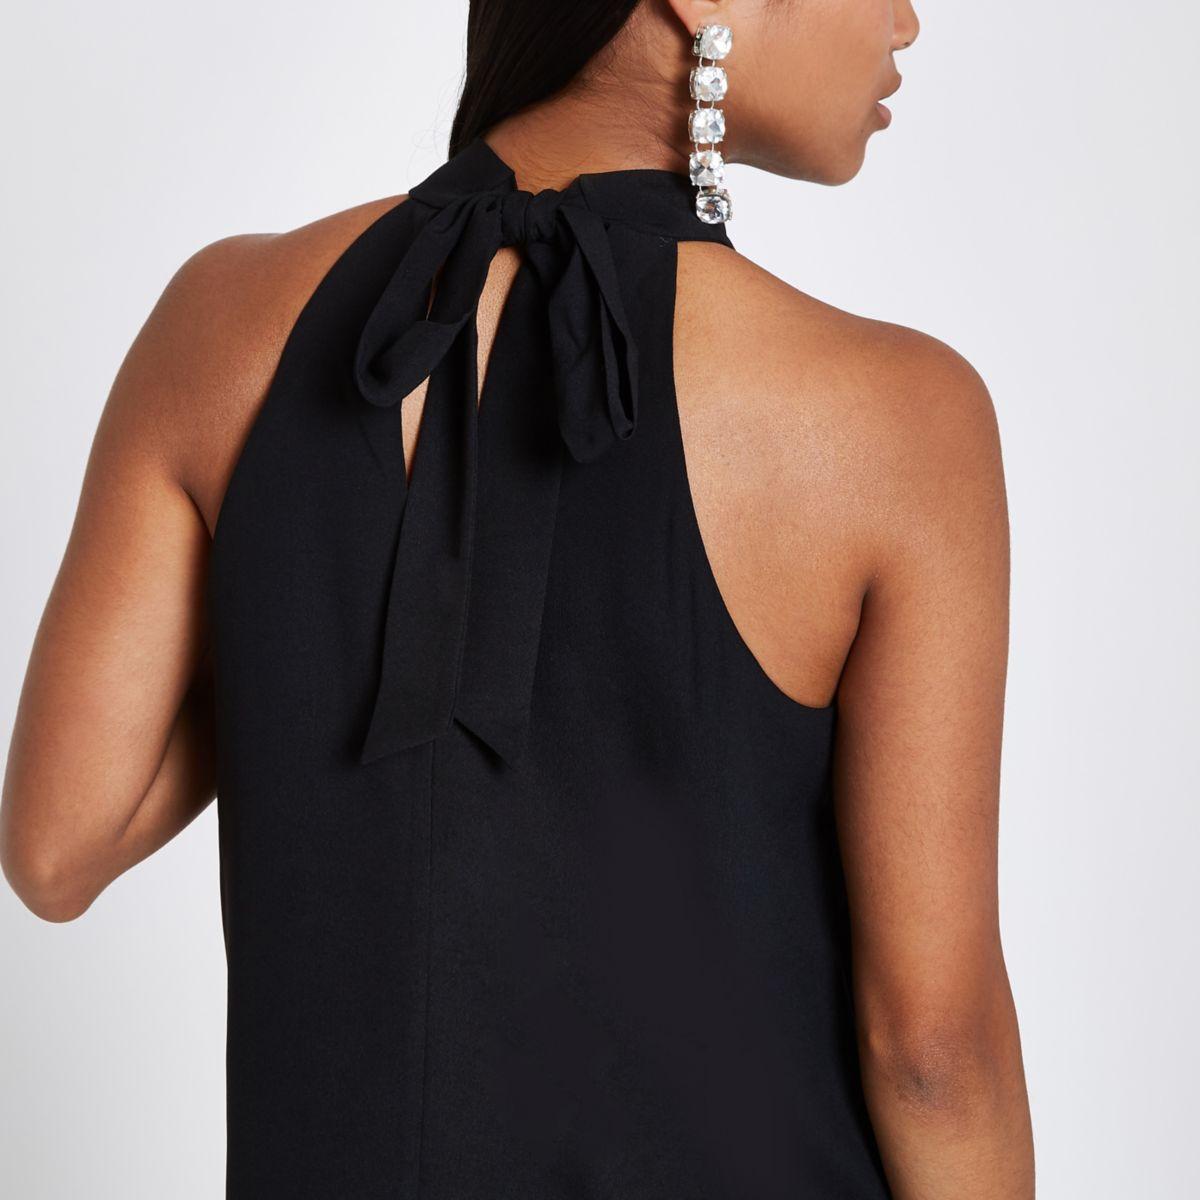 Petite black tie halter neck top